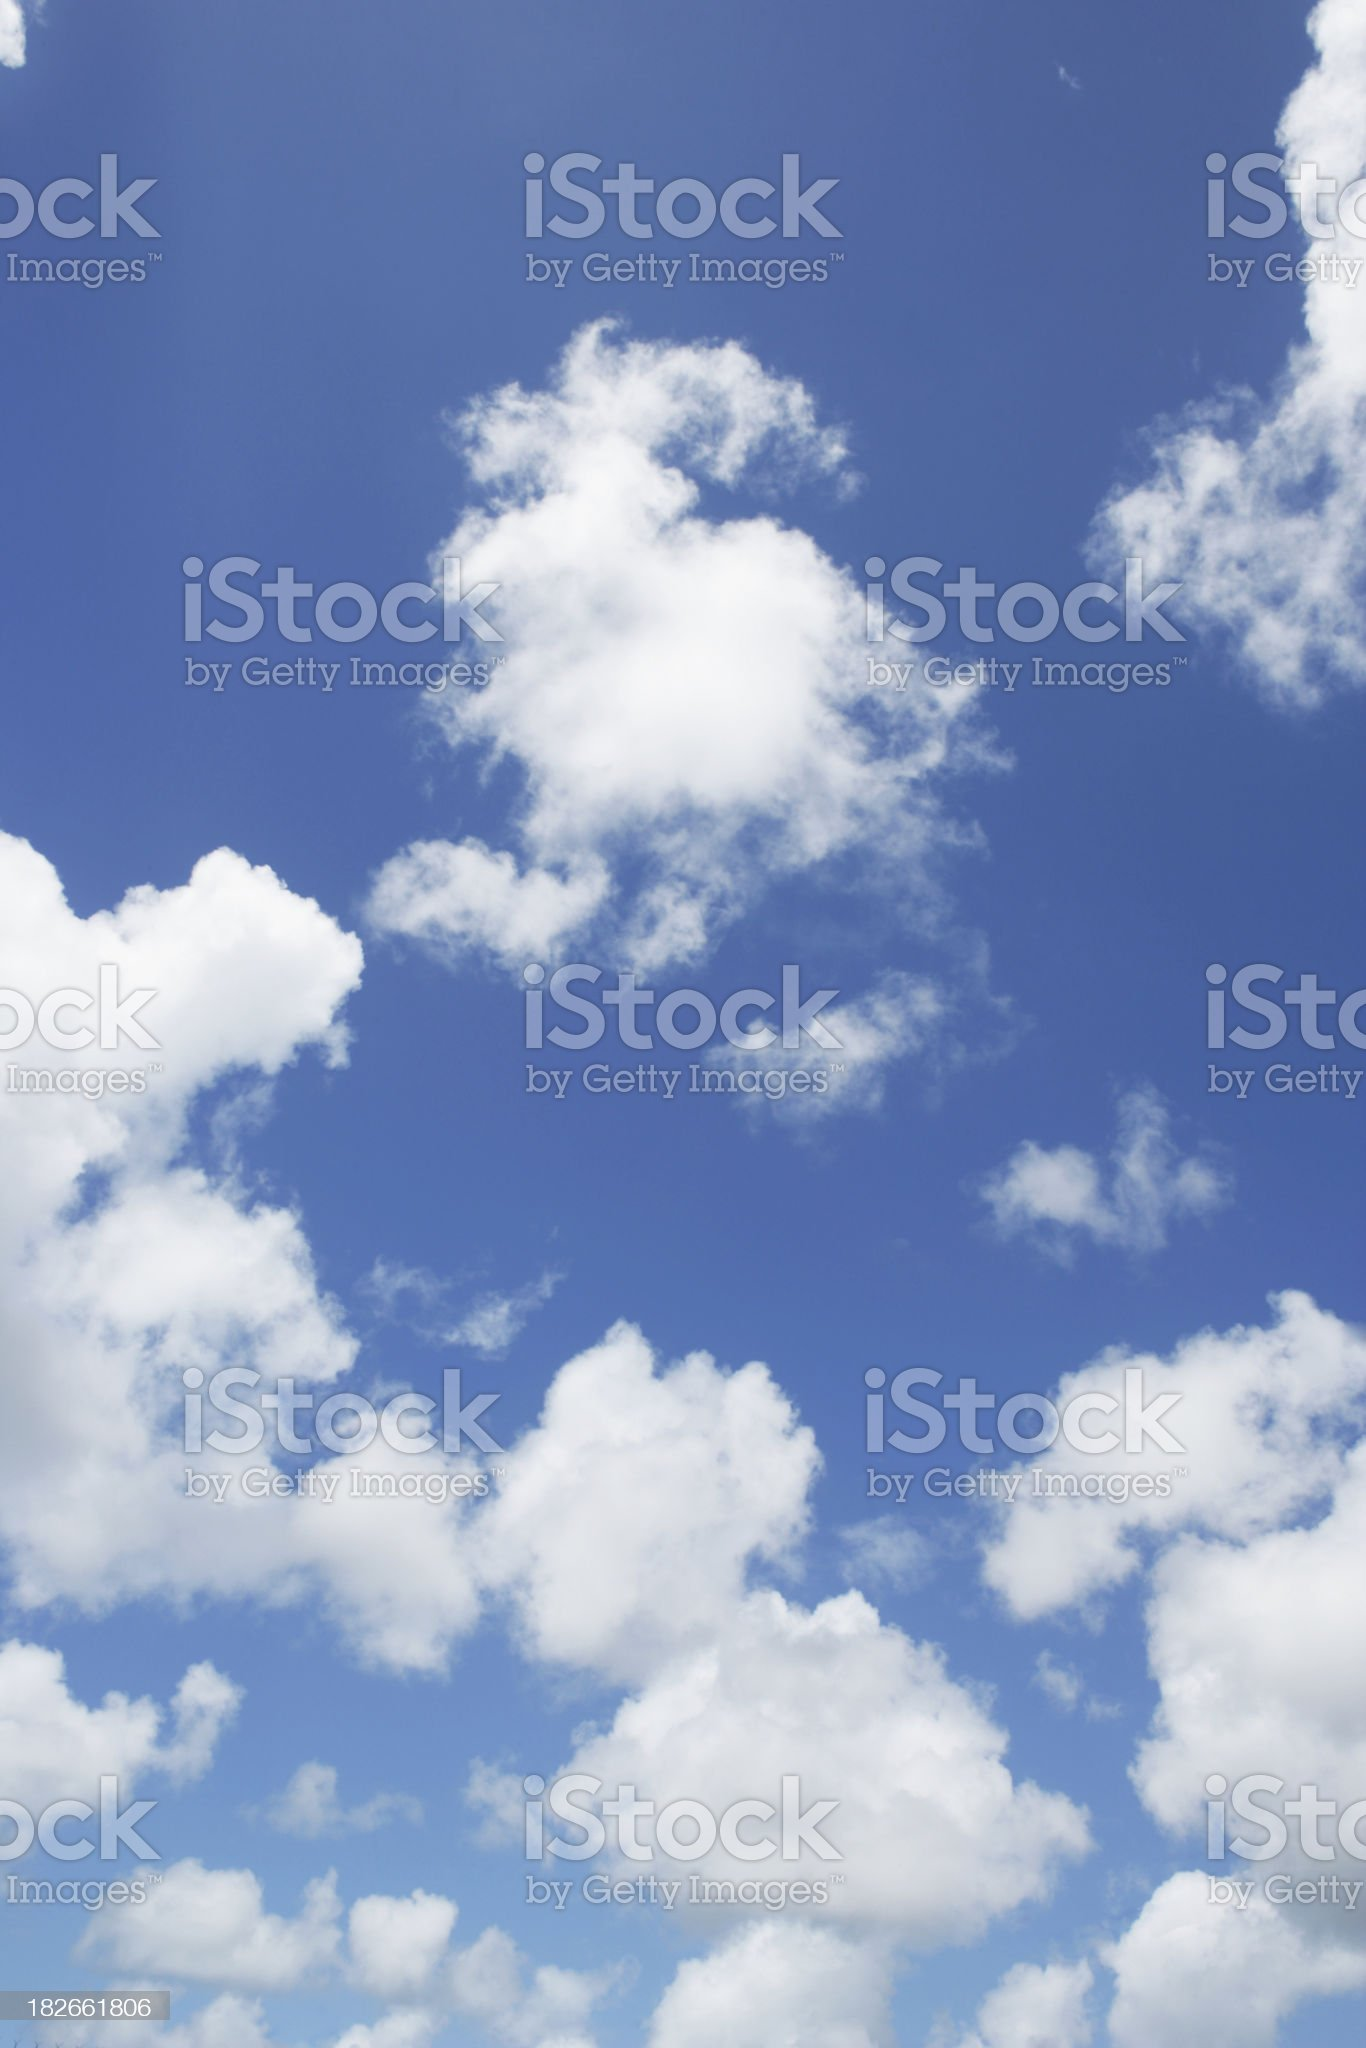 Imagination of Sky royalty-free stock photo